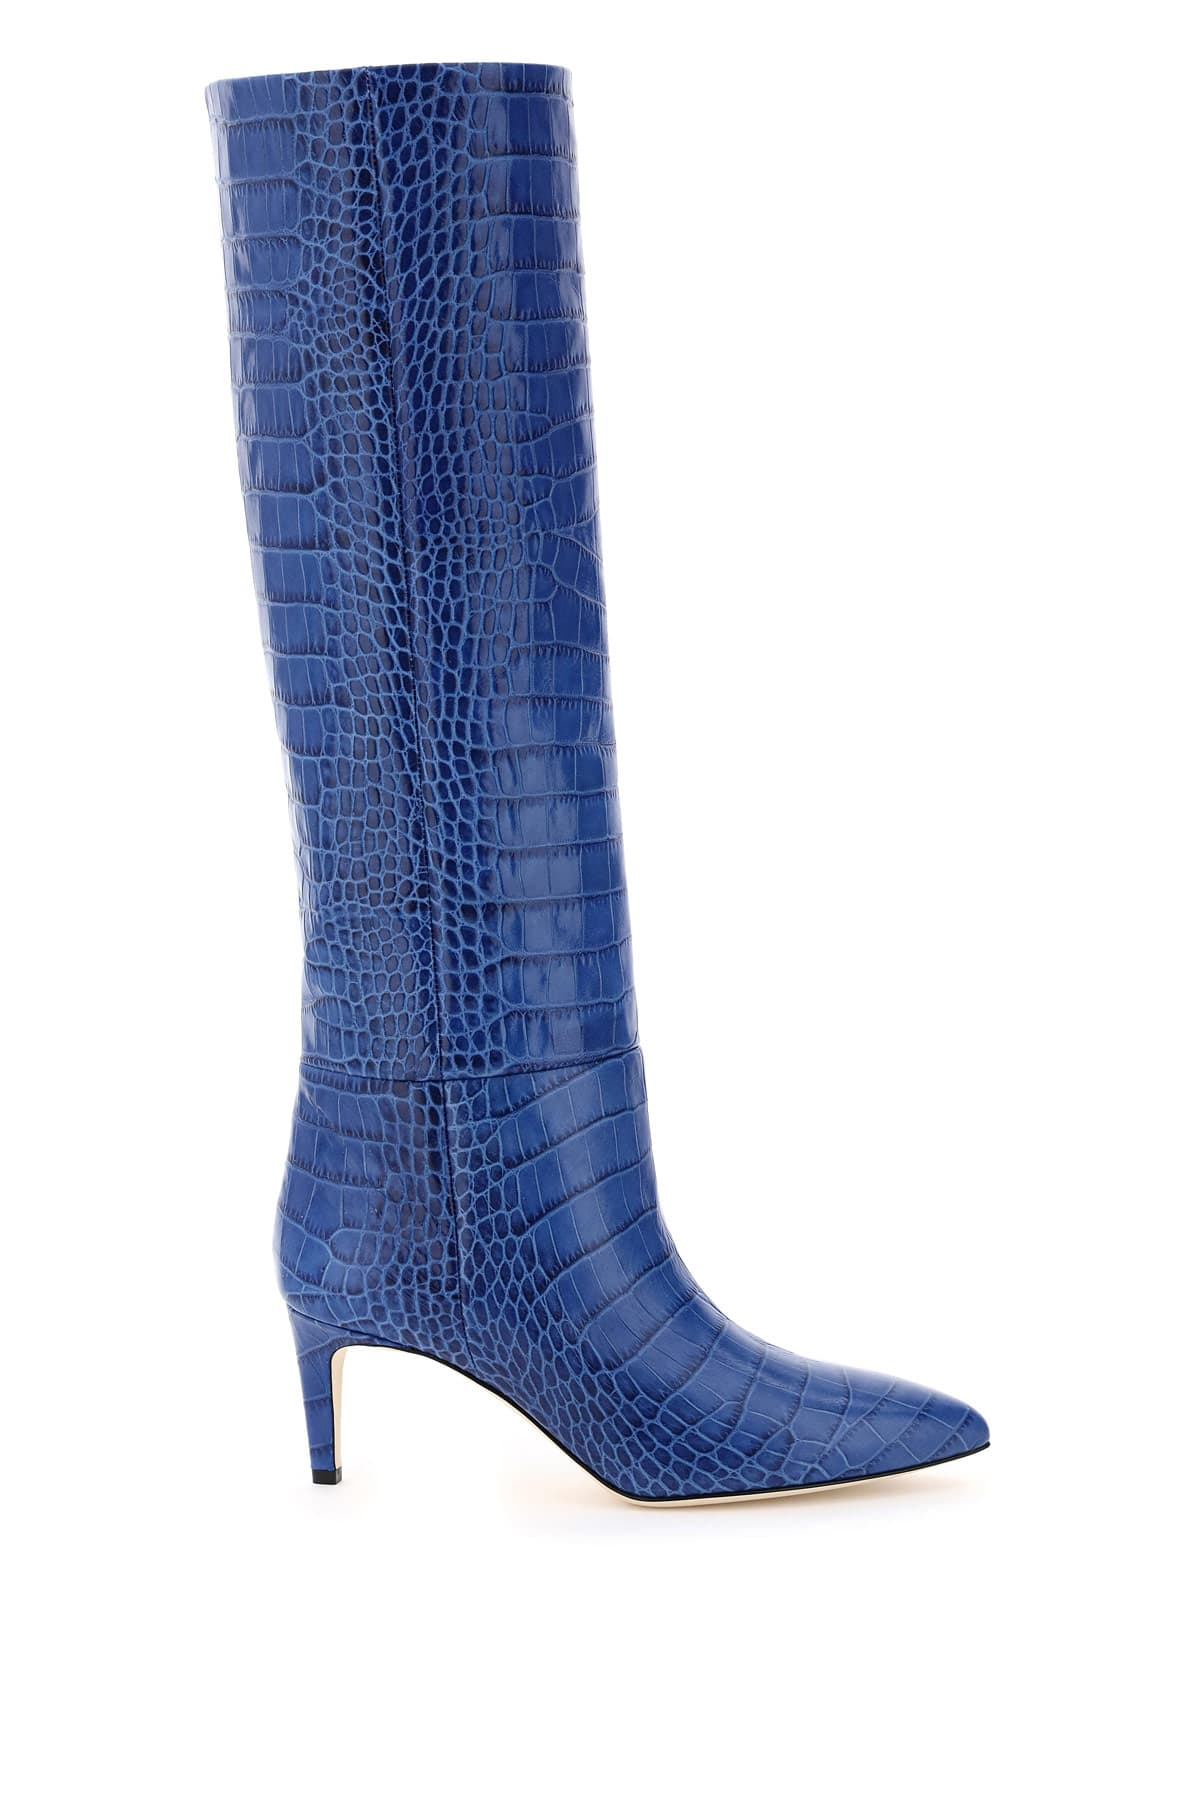 PARIS TEXAS CROCODILE-EMBOSSED BOOTS 38 Blue, Light blue Leather